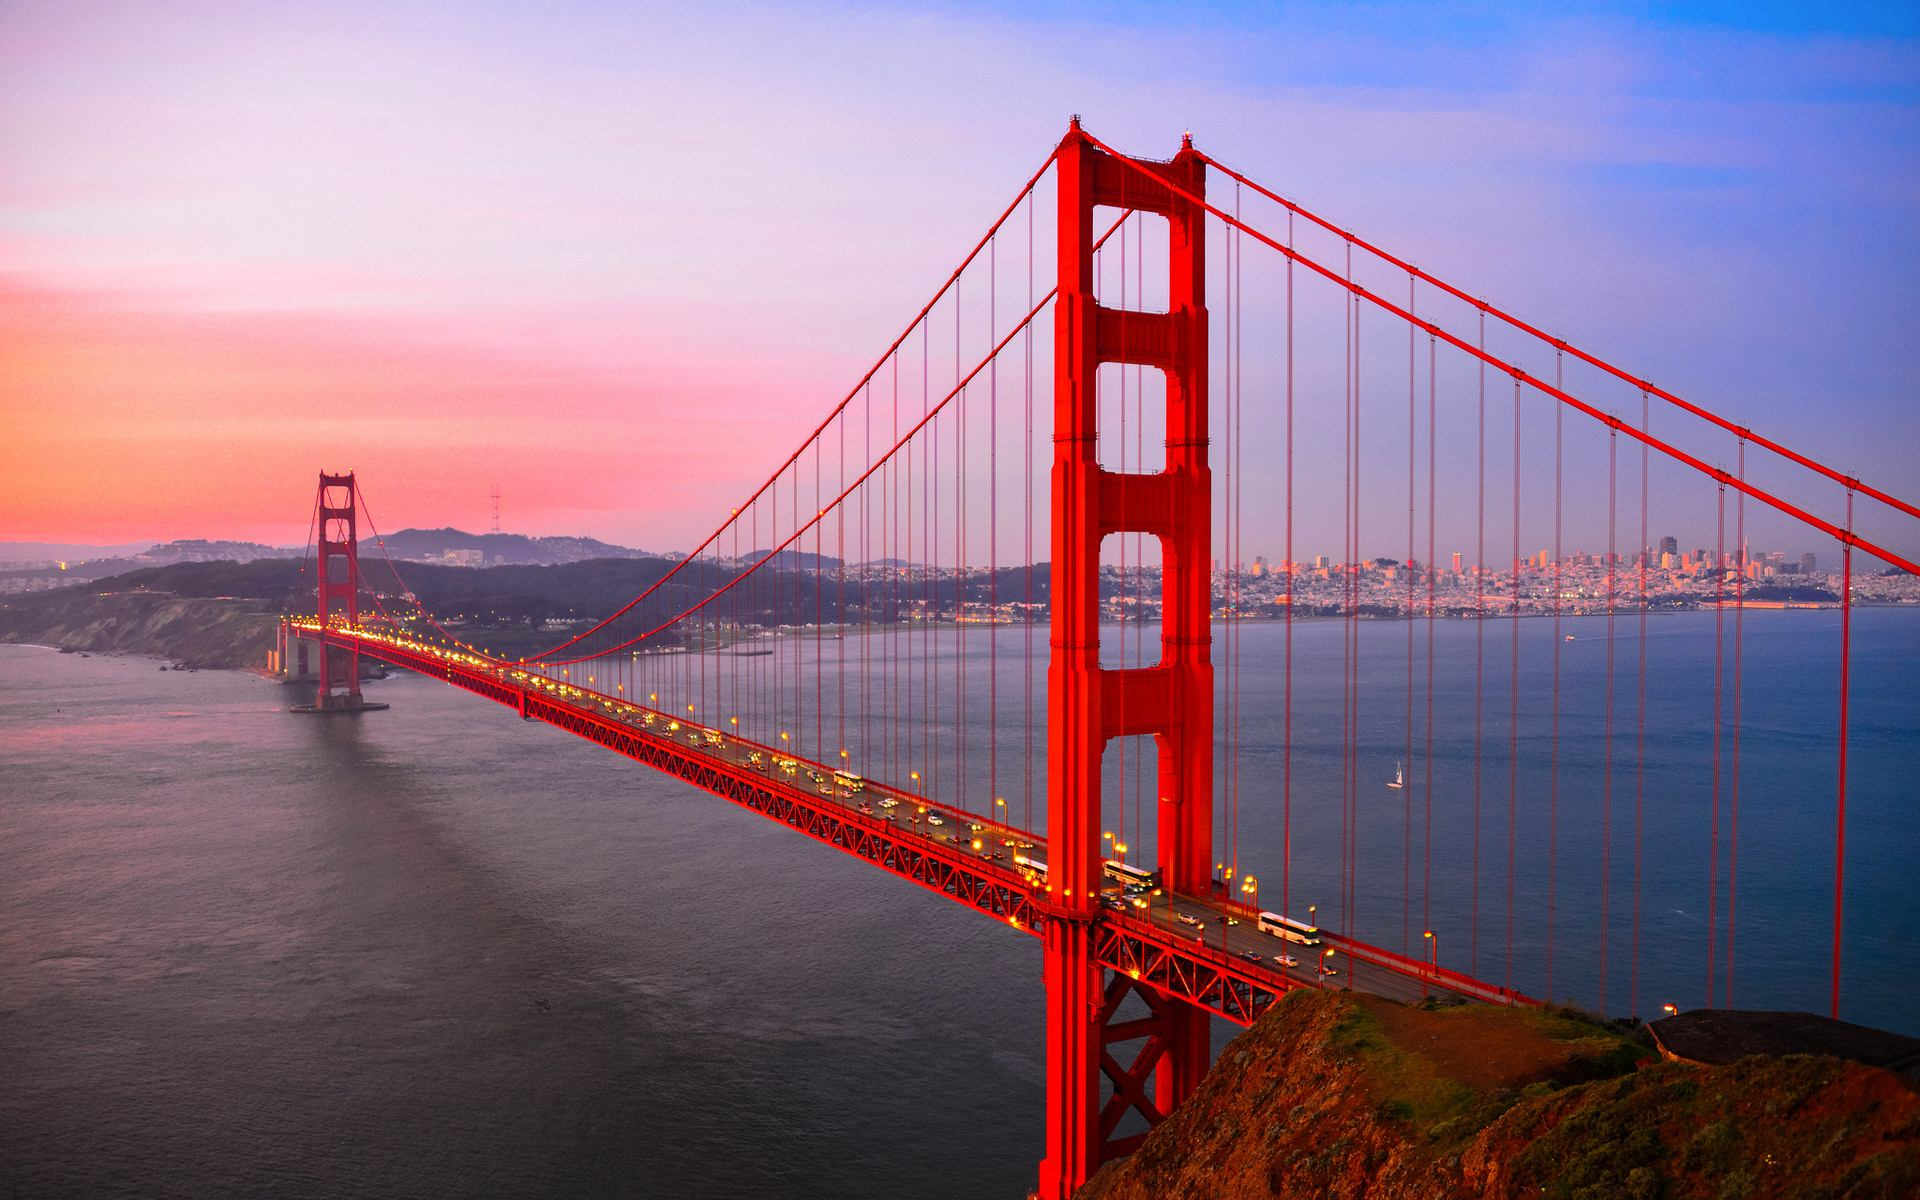 сан франциско мост фото